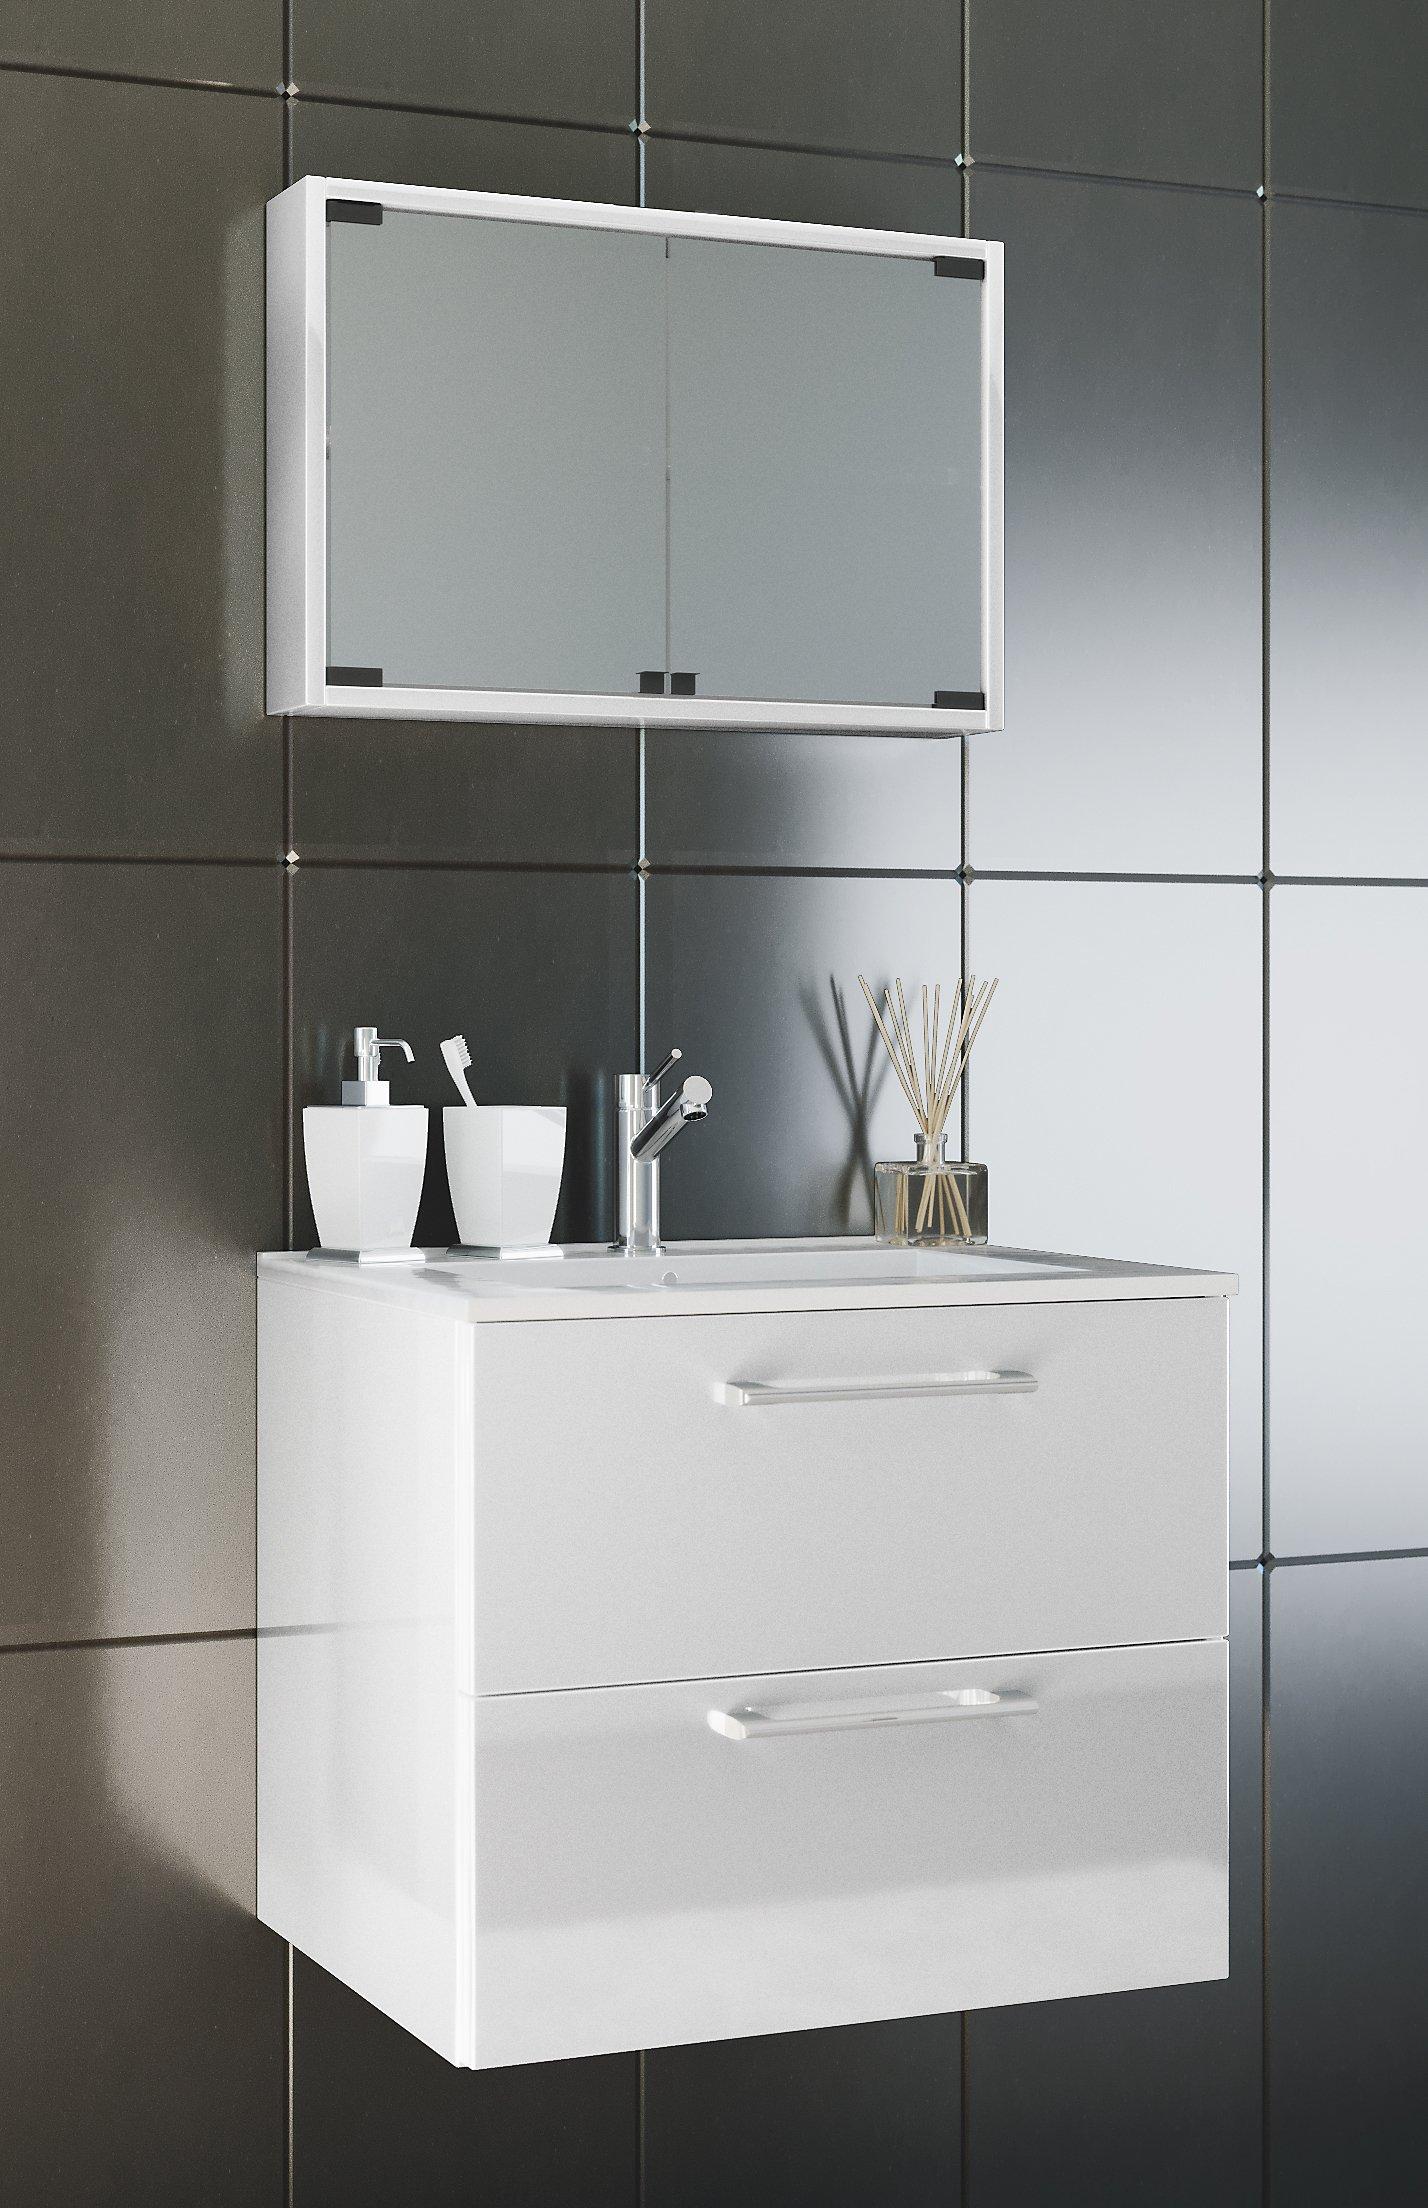 Vcm Waschplatz Badmobel Badezimmer Komplett Set Waschtisch